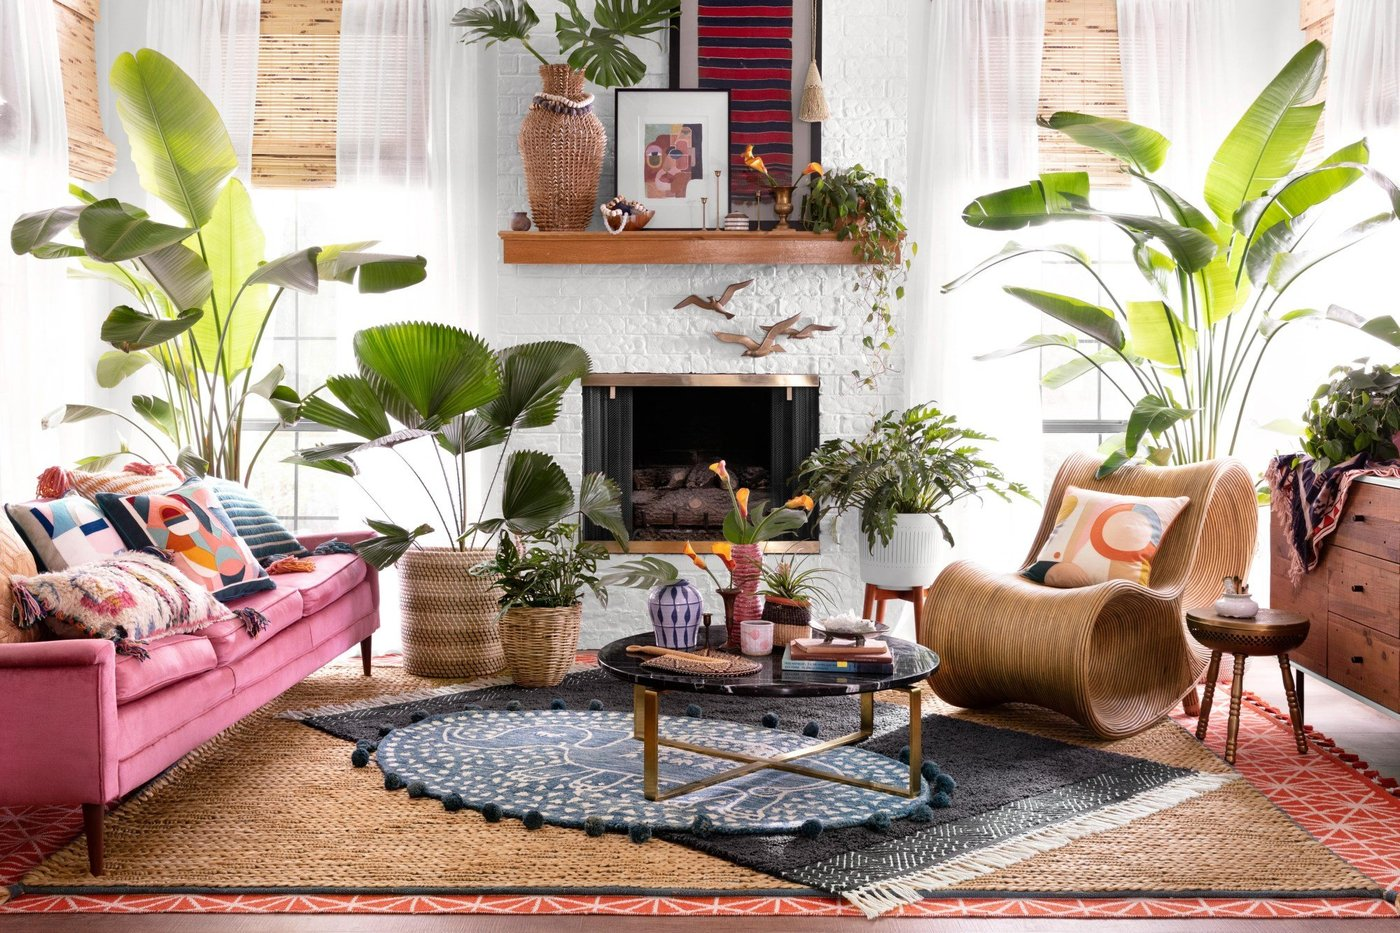 More is More - Boho Living Room Ideas